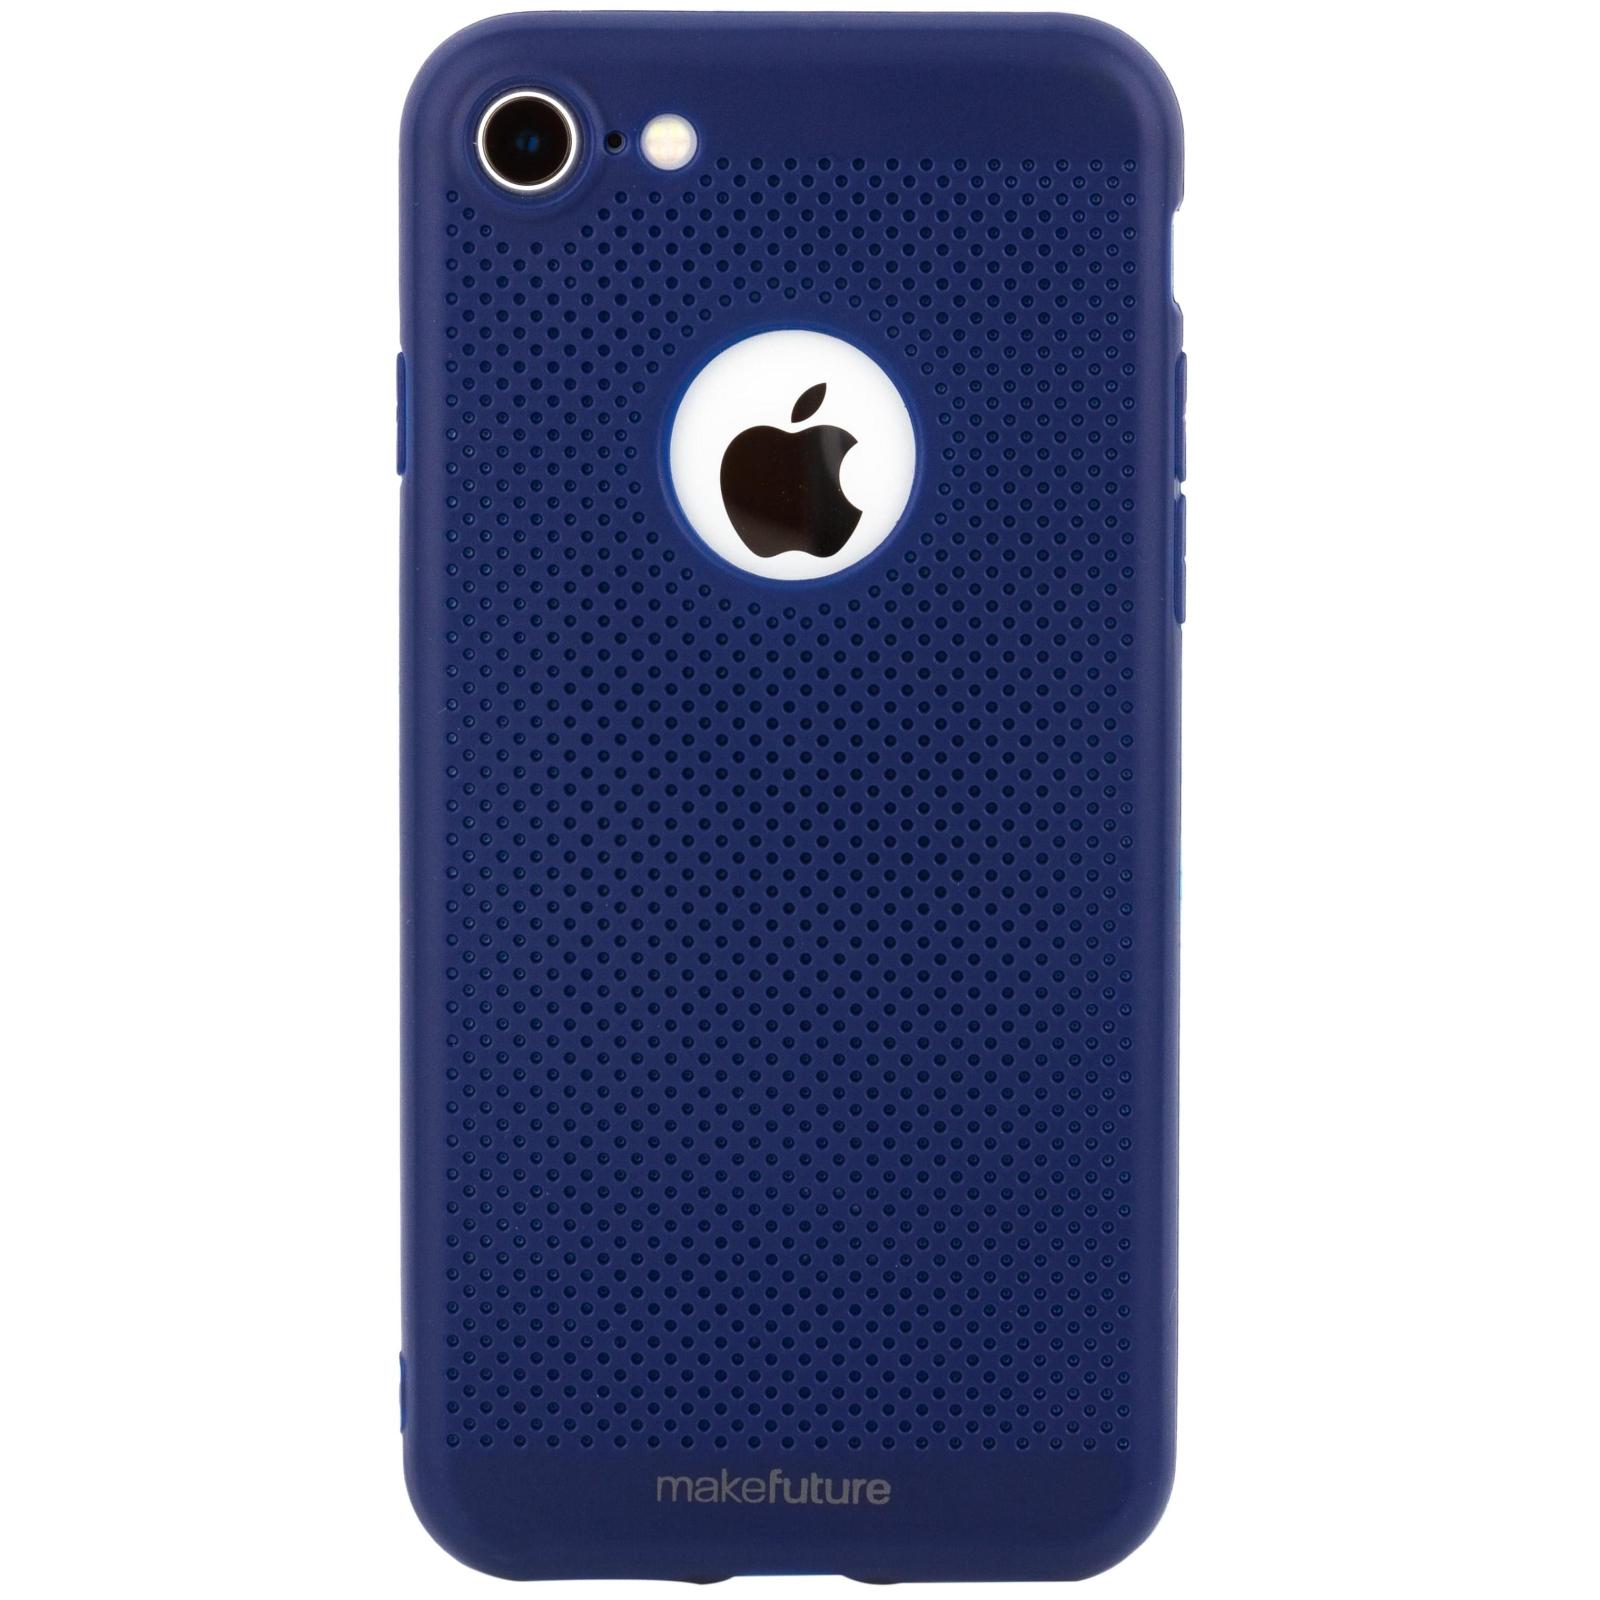 Чехол для моб. телефона MakeFuture Moon Case (TPU) для Apple iPhone 8 Blue (MCM-AI8BL)